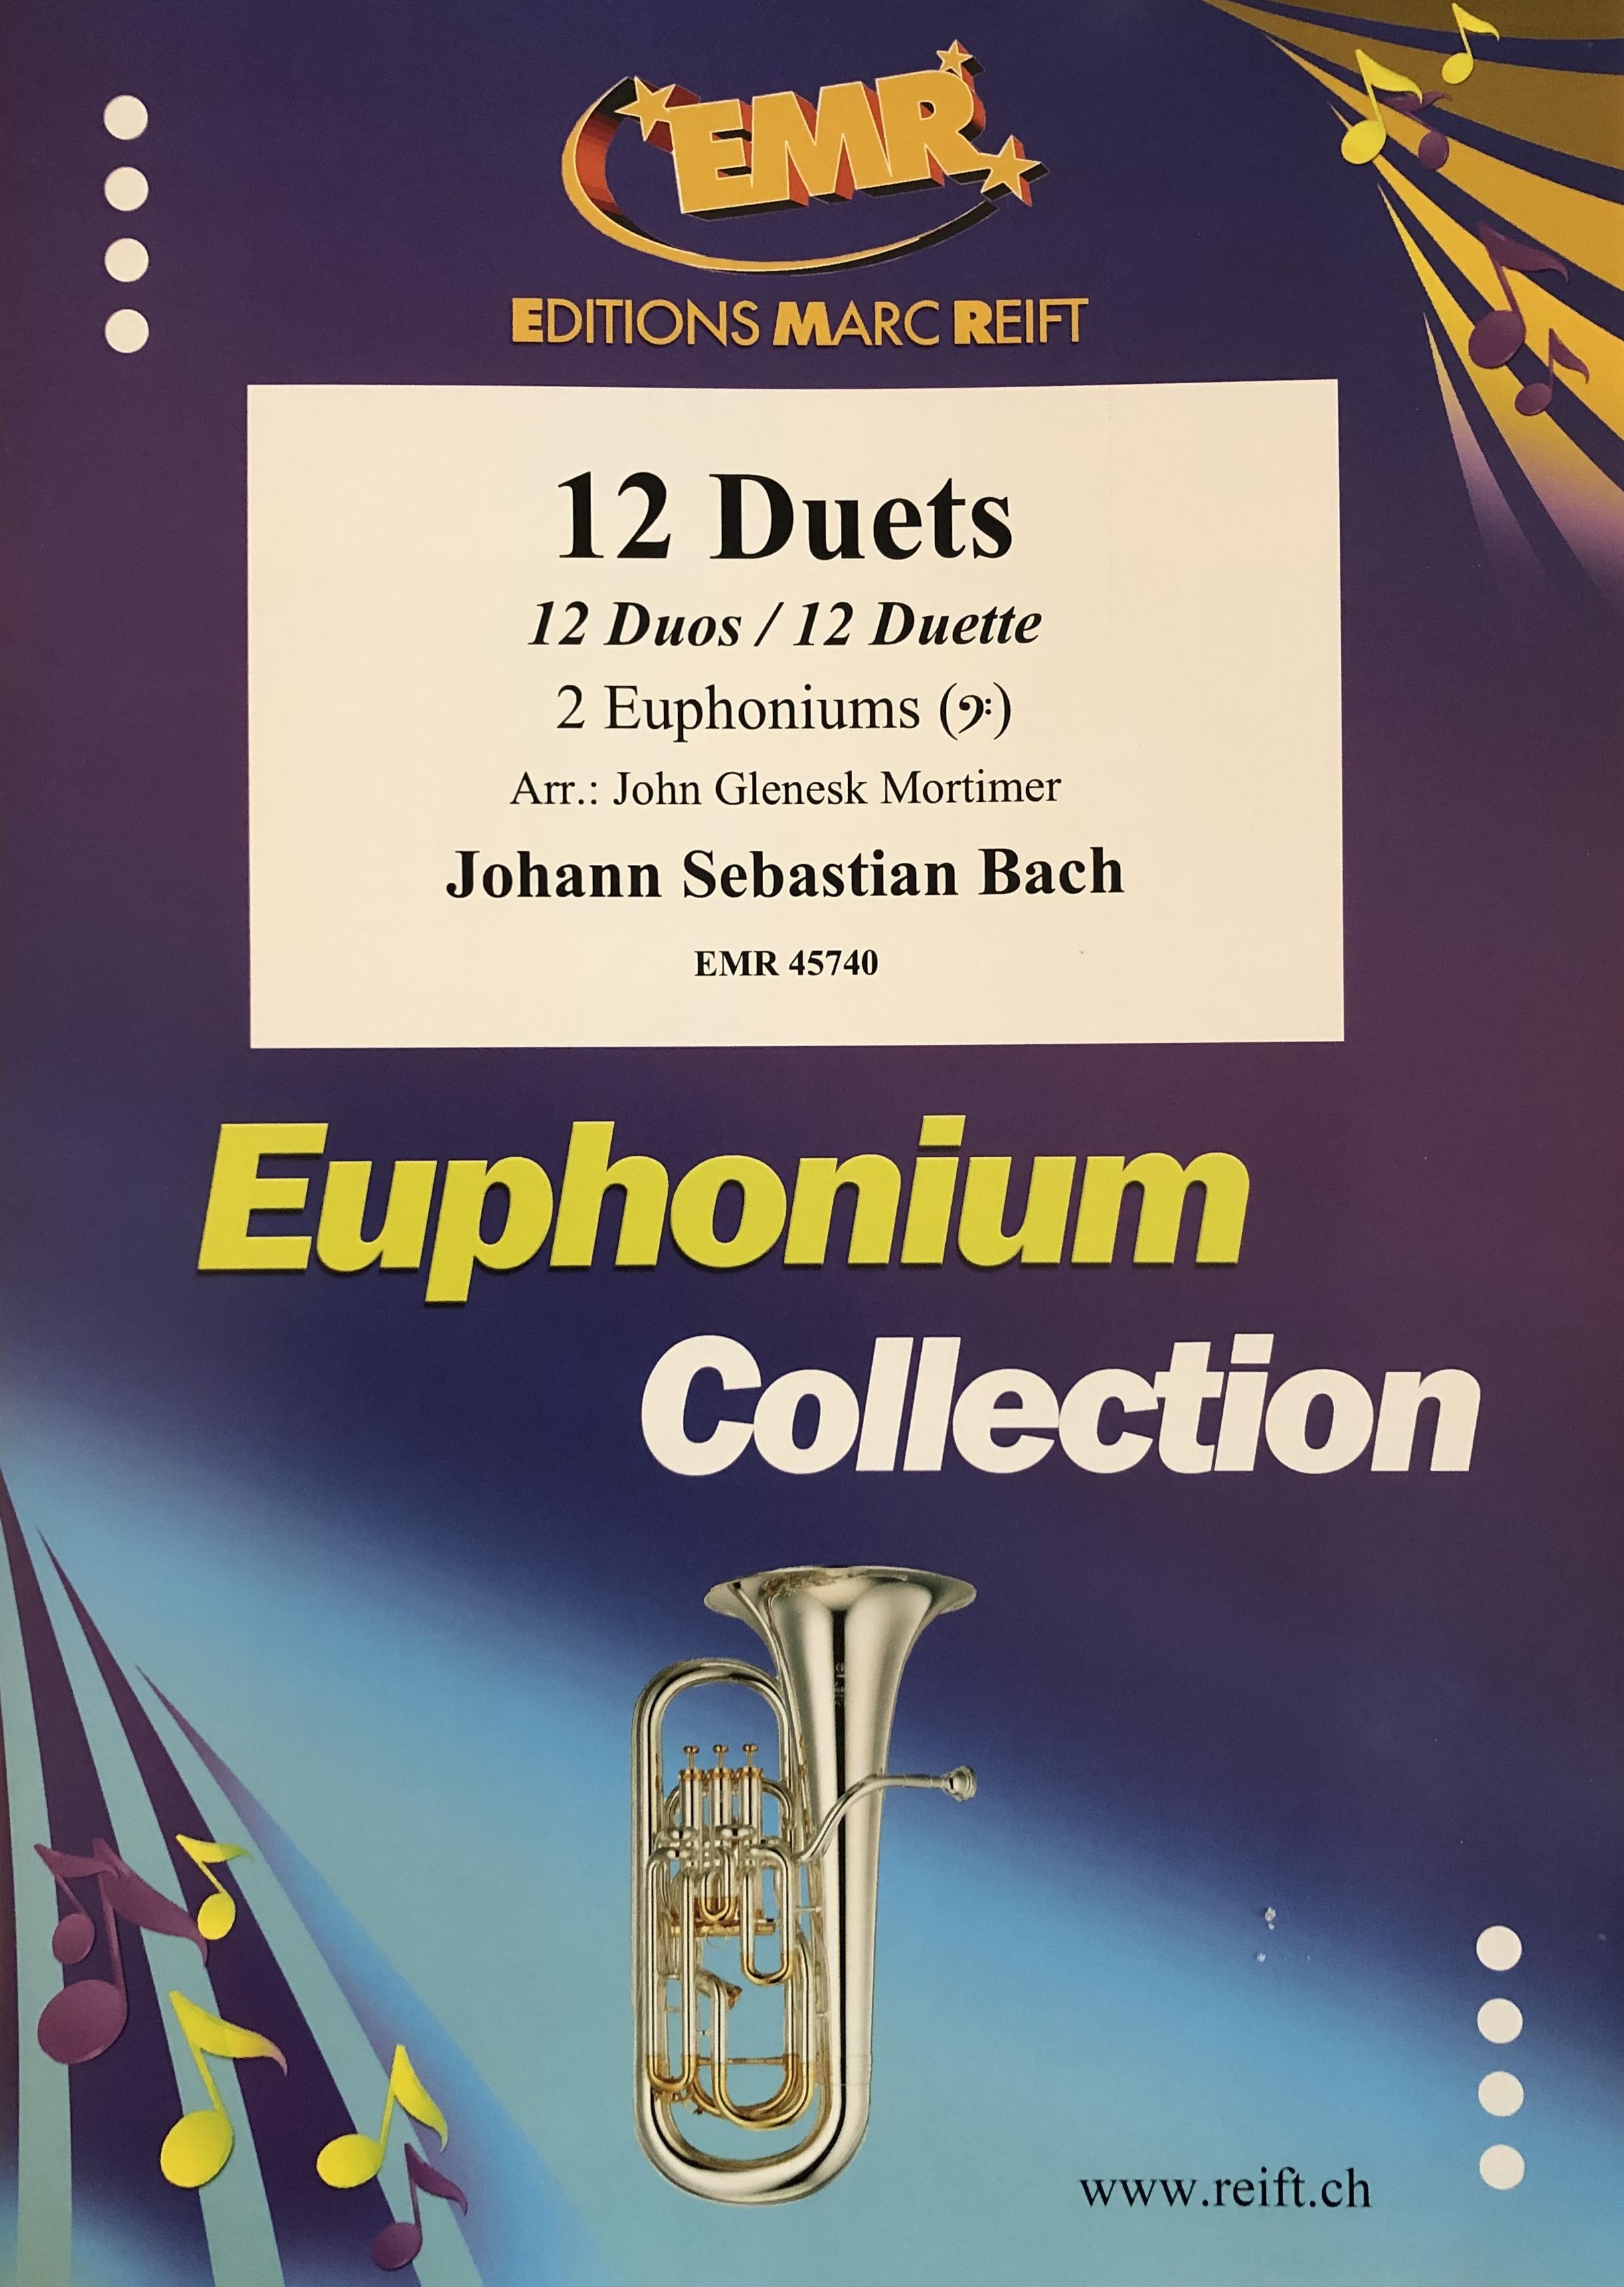 12 Duets for 2 Euphoniums (bass clef) - JS Bach Arr John Mortimer